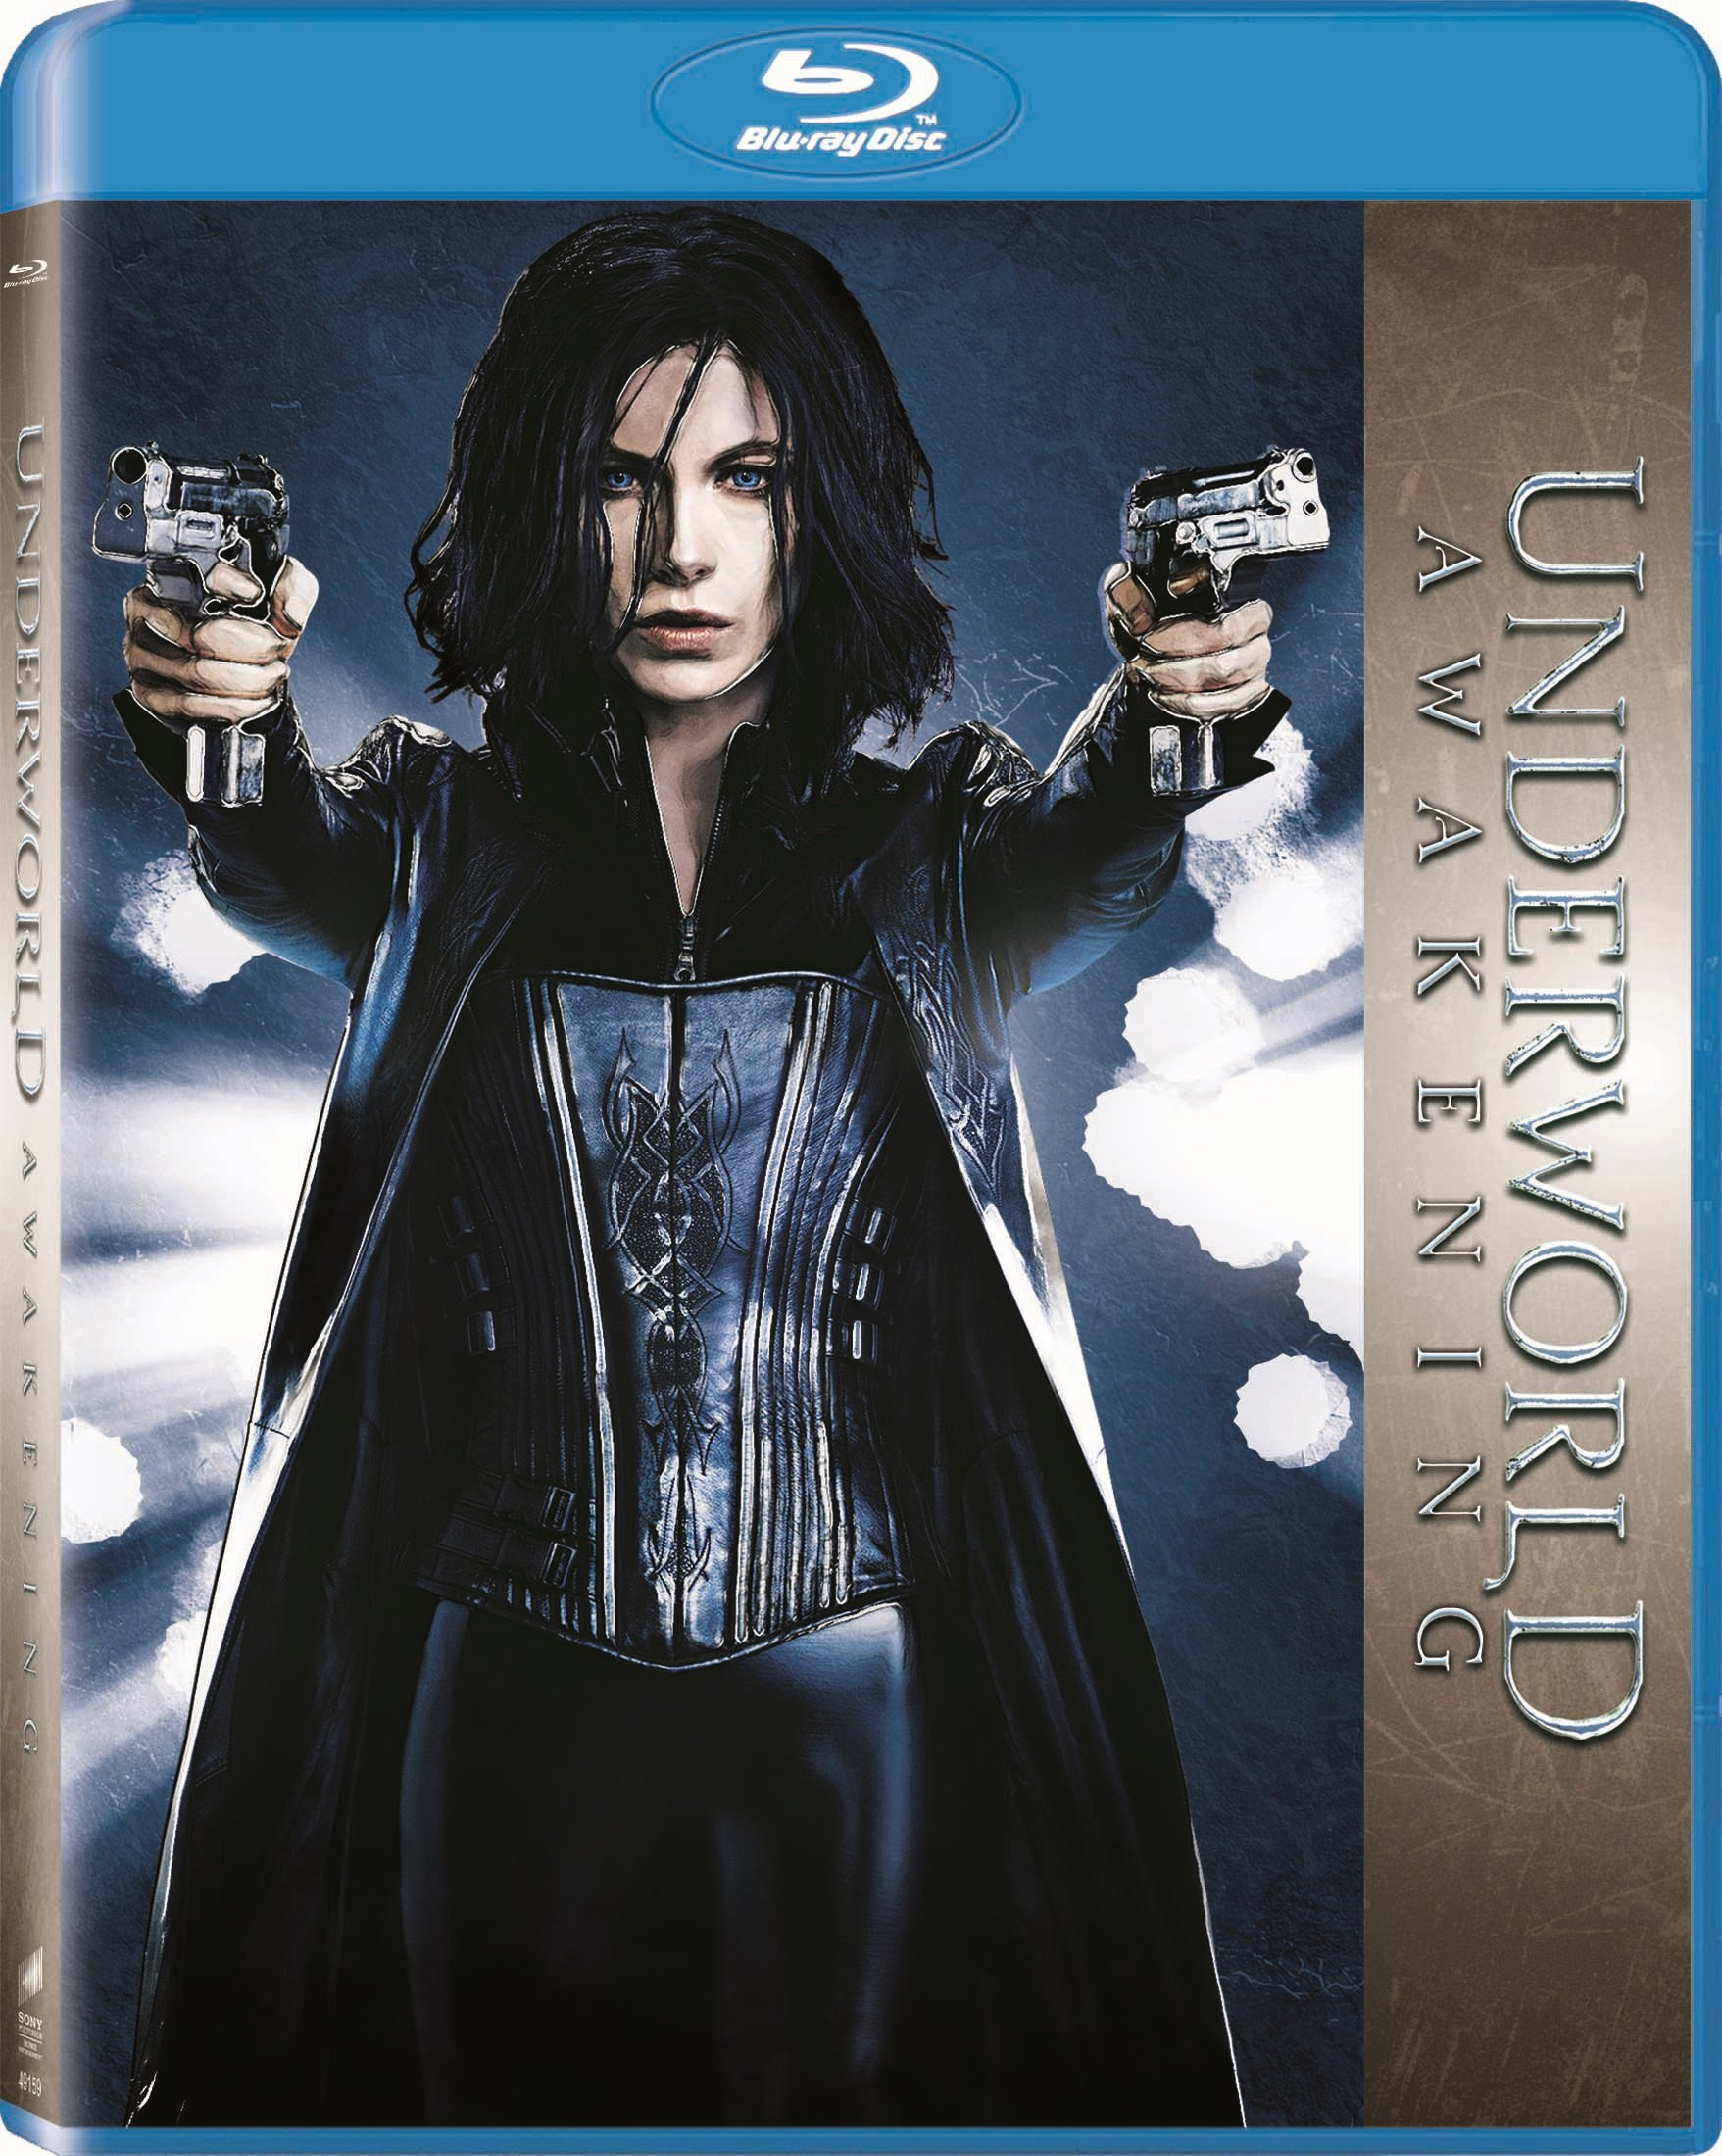 Blu-ray : Underworld Awakening (Ultraviolet Digital Copy, Widescreen, , Dubbed, With Movie Cash)